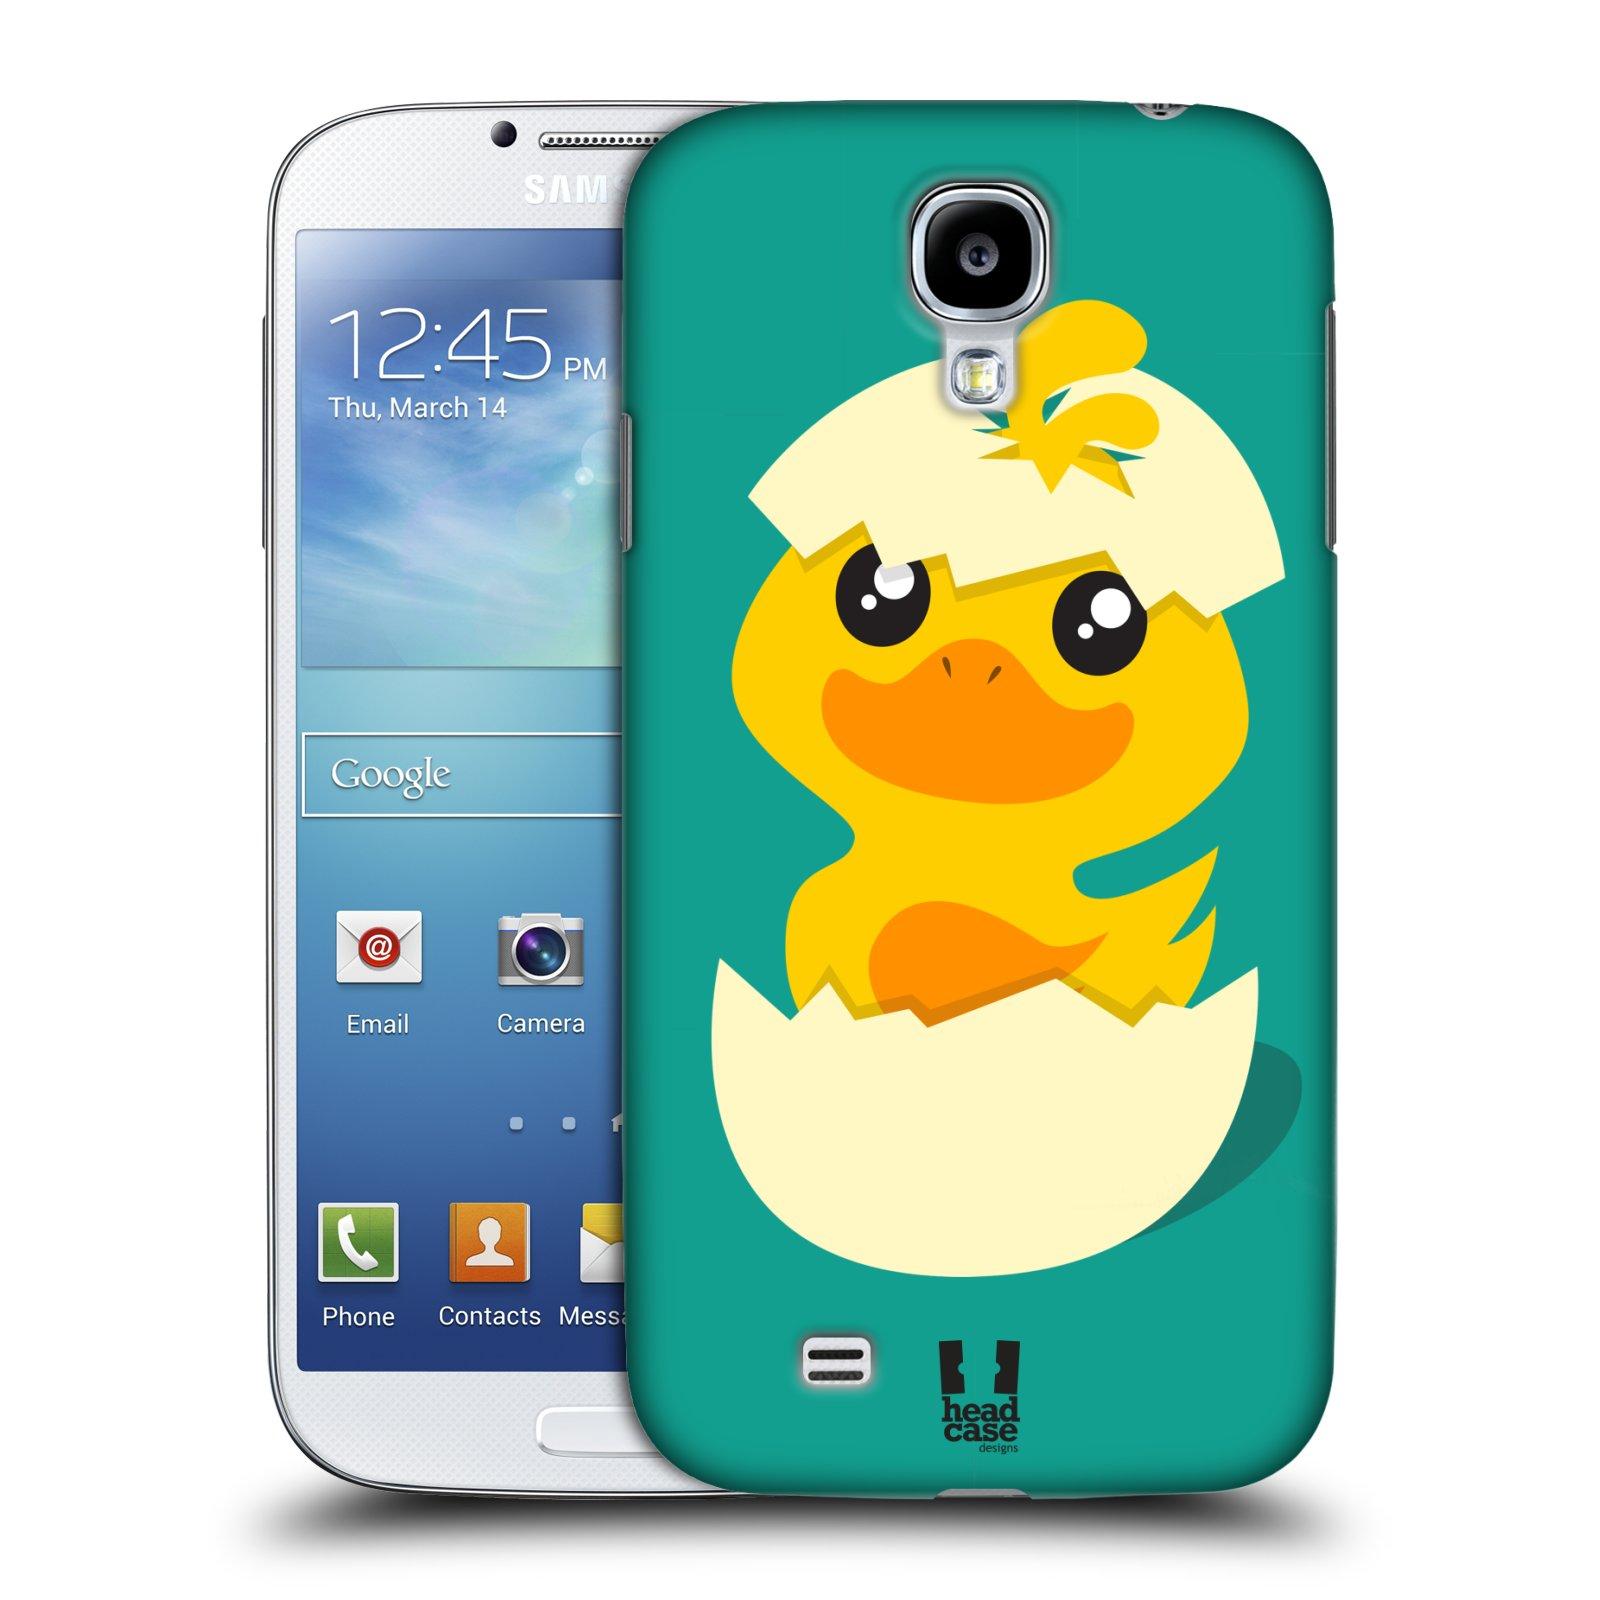 Plastové pouzdro na mobil Samsung Galaxy S4 HEAD CASE KACHNIČKA Z VAJÍČKA (Kryt či obal na mobilní telefon Samsung Galaxy S4 GT-i9505 / i9500)